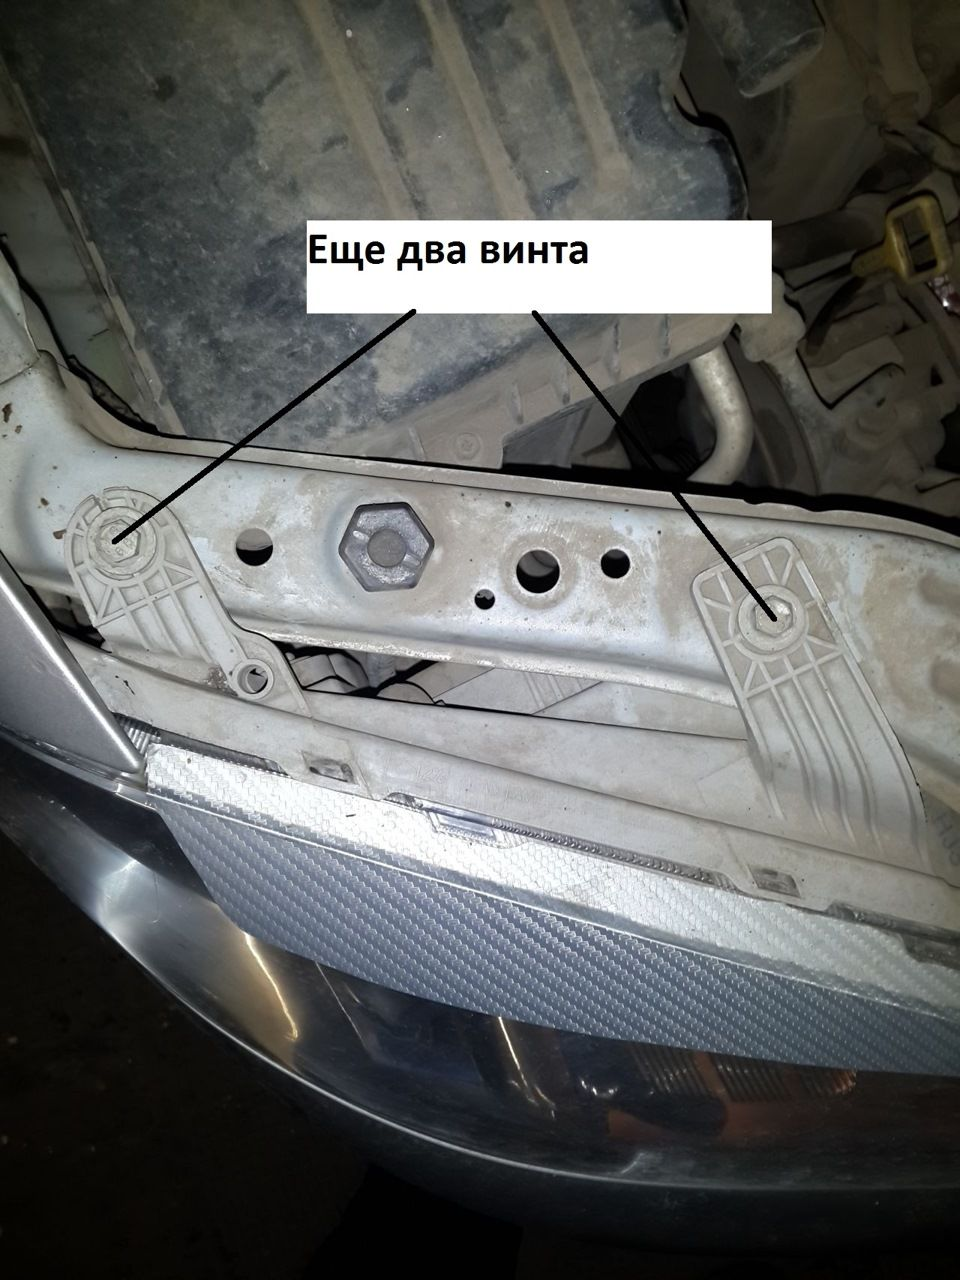 Верхнее крепление фары Chevrolet Aveo